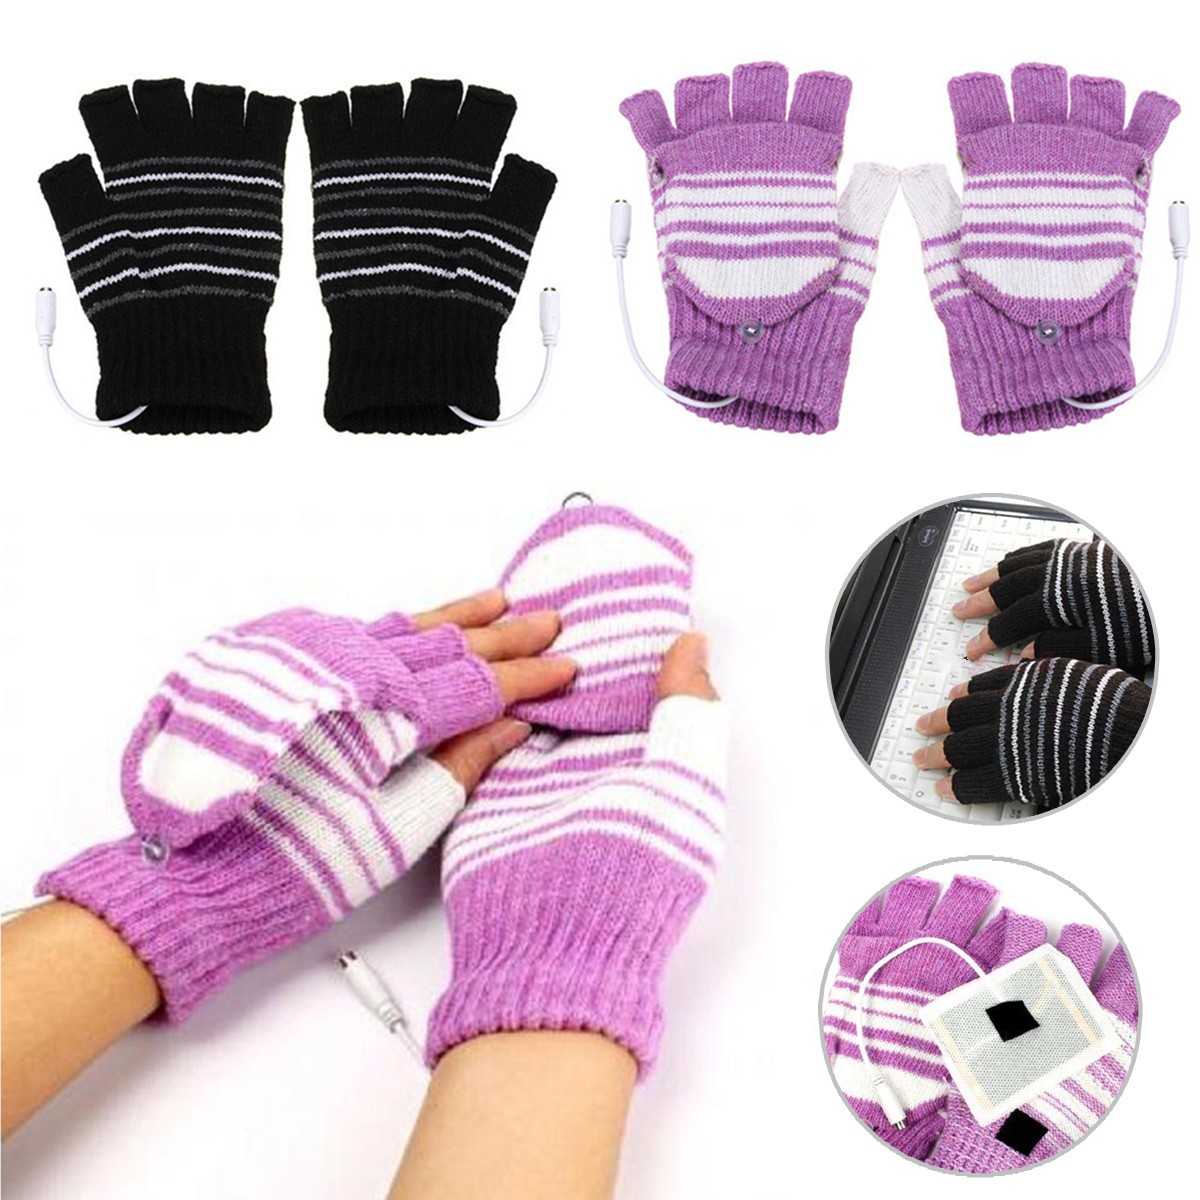 77BE USB Heated Warm Gloves Half Finger Winter Heating Knitting Mittens